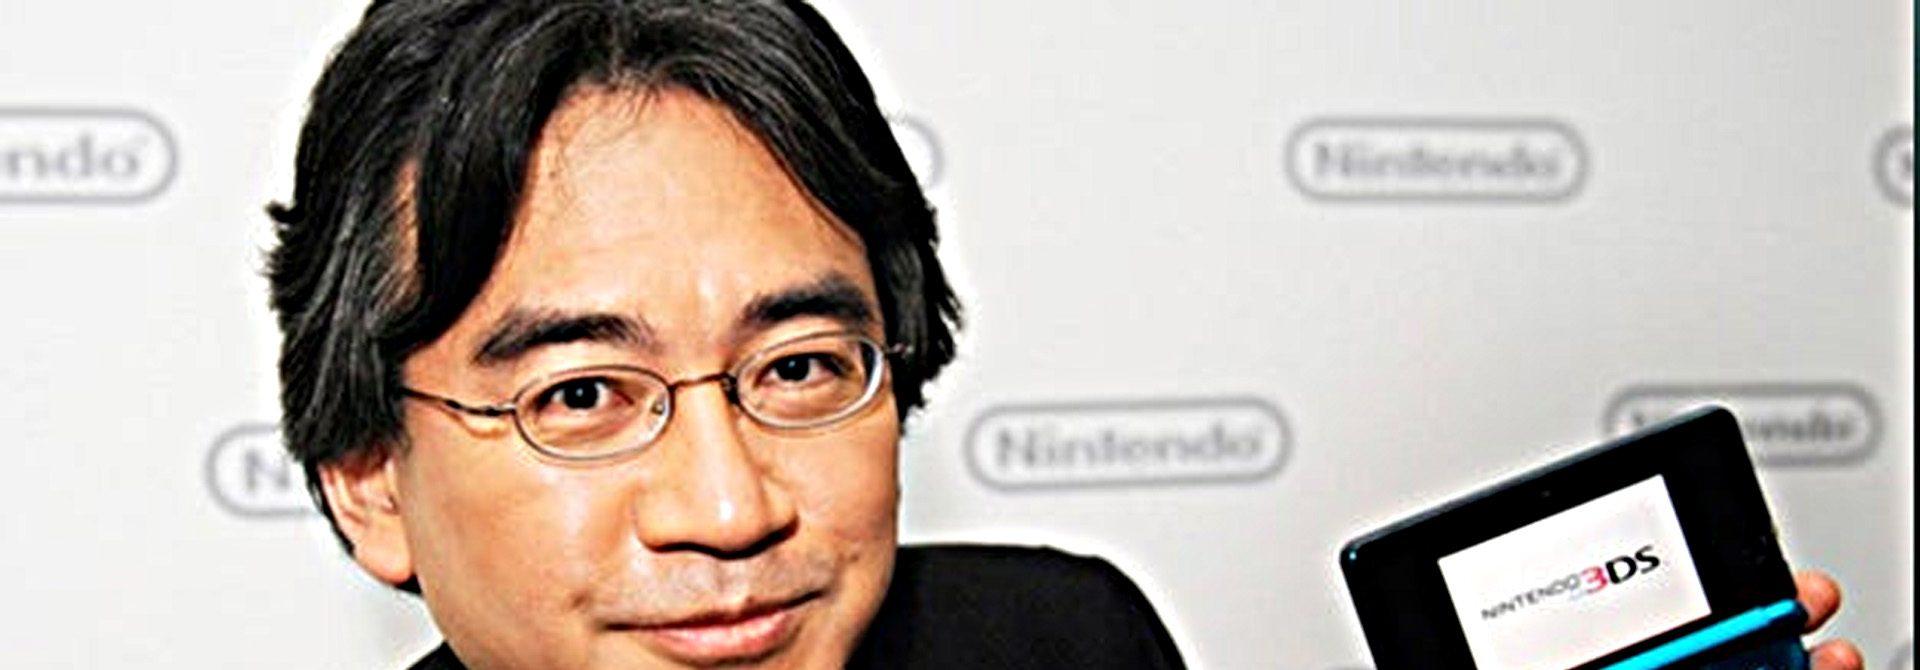 Satoru Iwata Memorial Book To Be Published In English